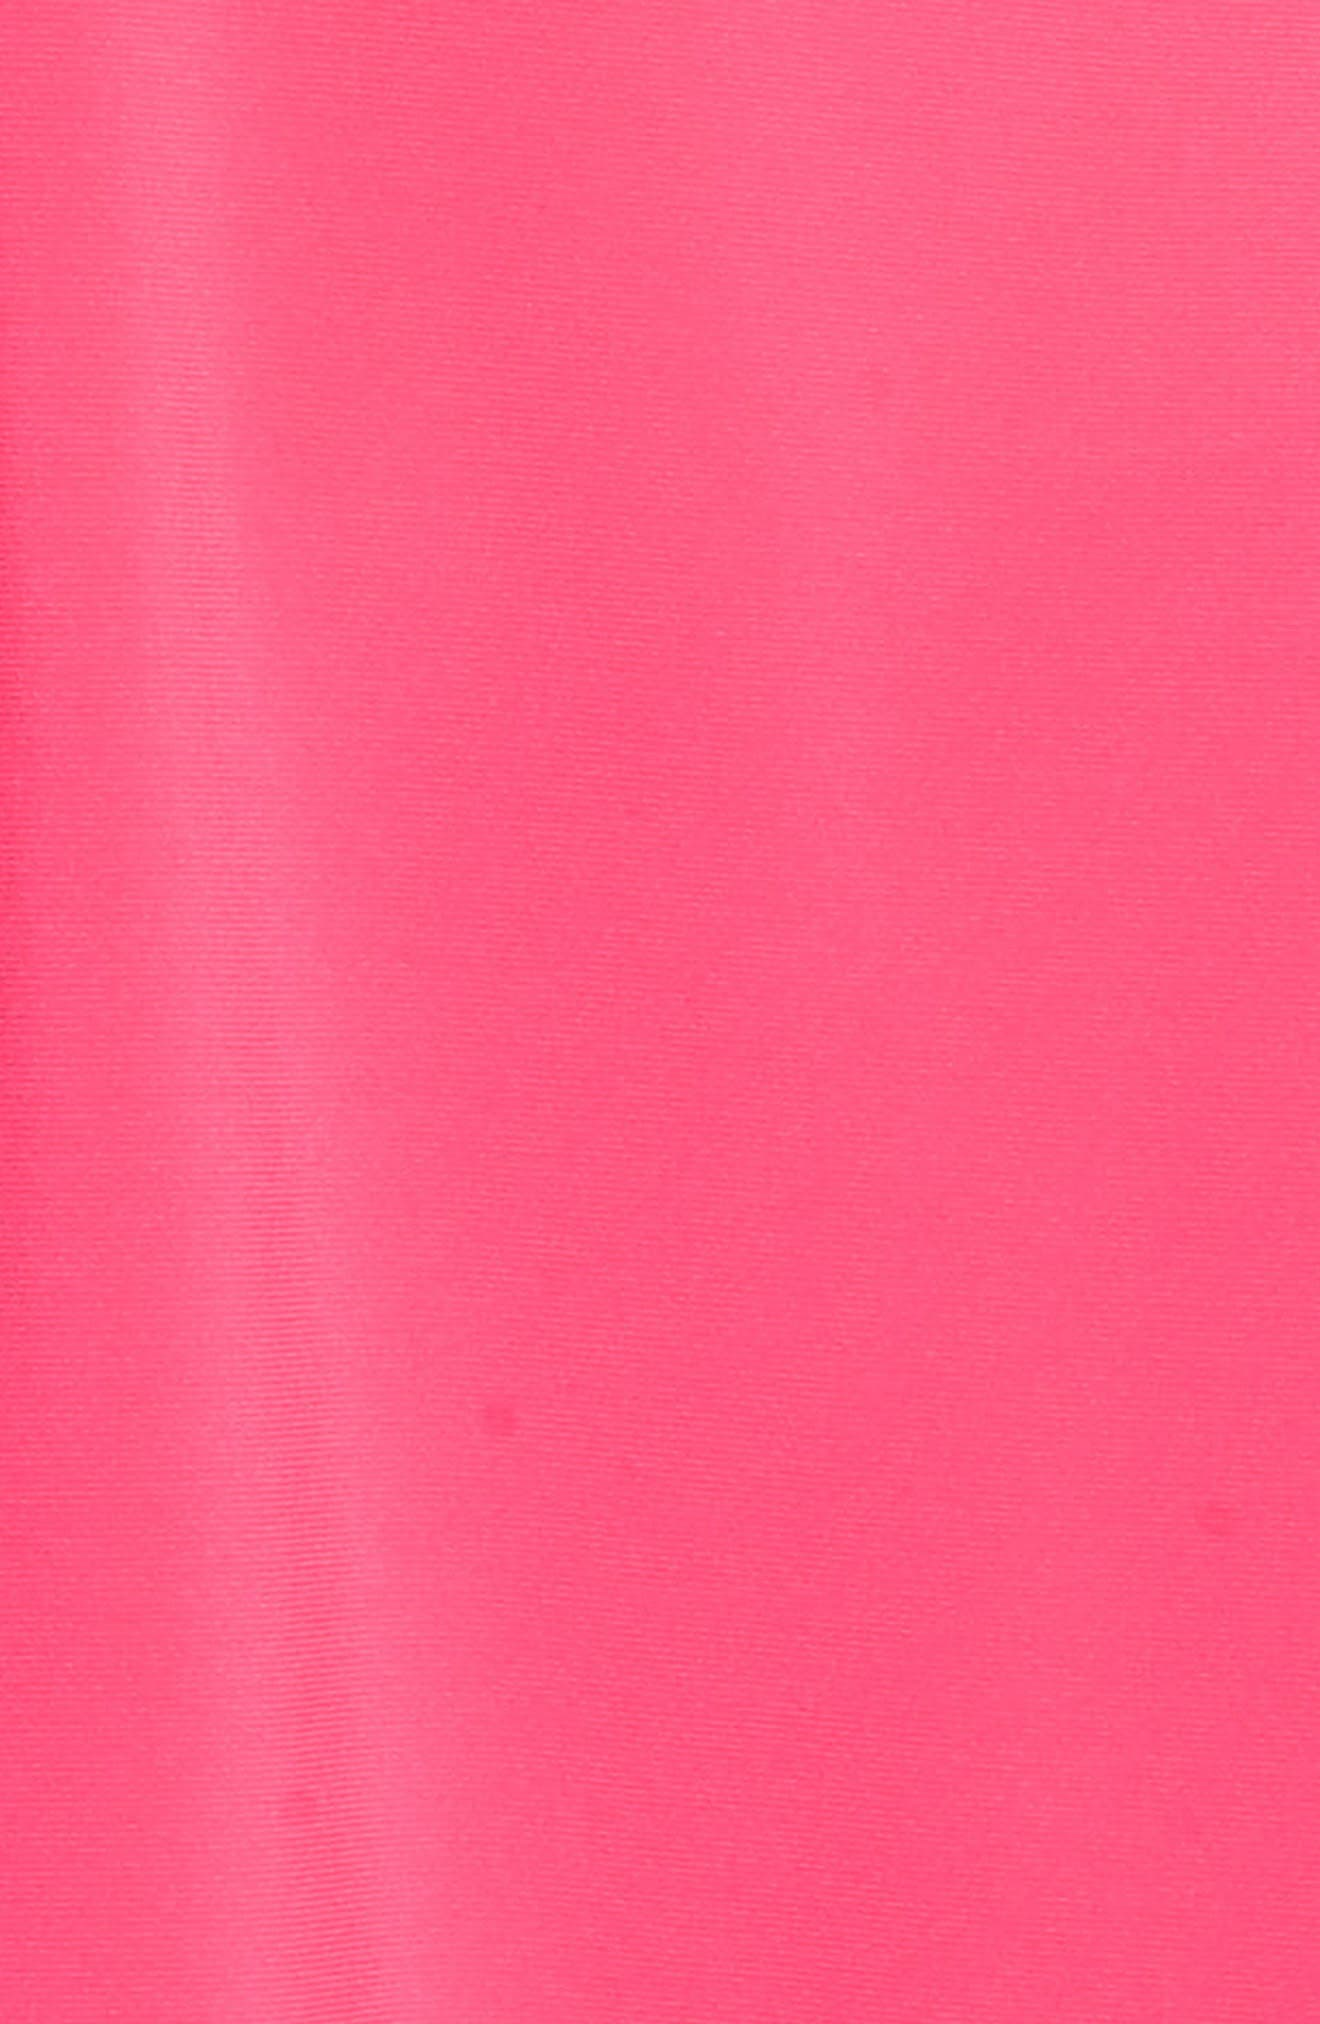 Zip Shoulder Handkerchief Top,                             Alternate thumbnail 5, color,                             Rhododendron